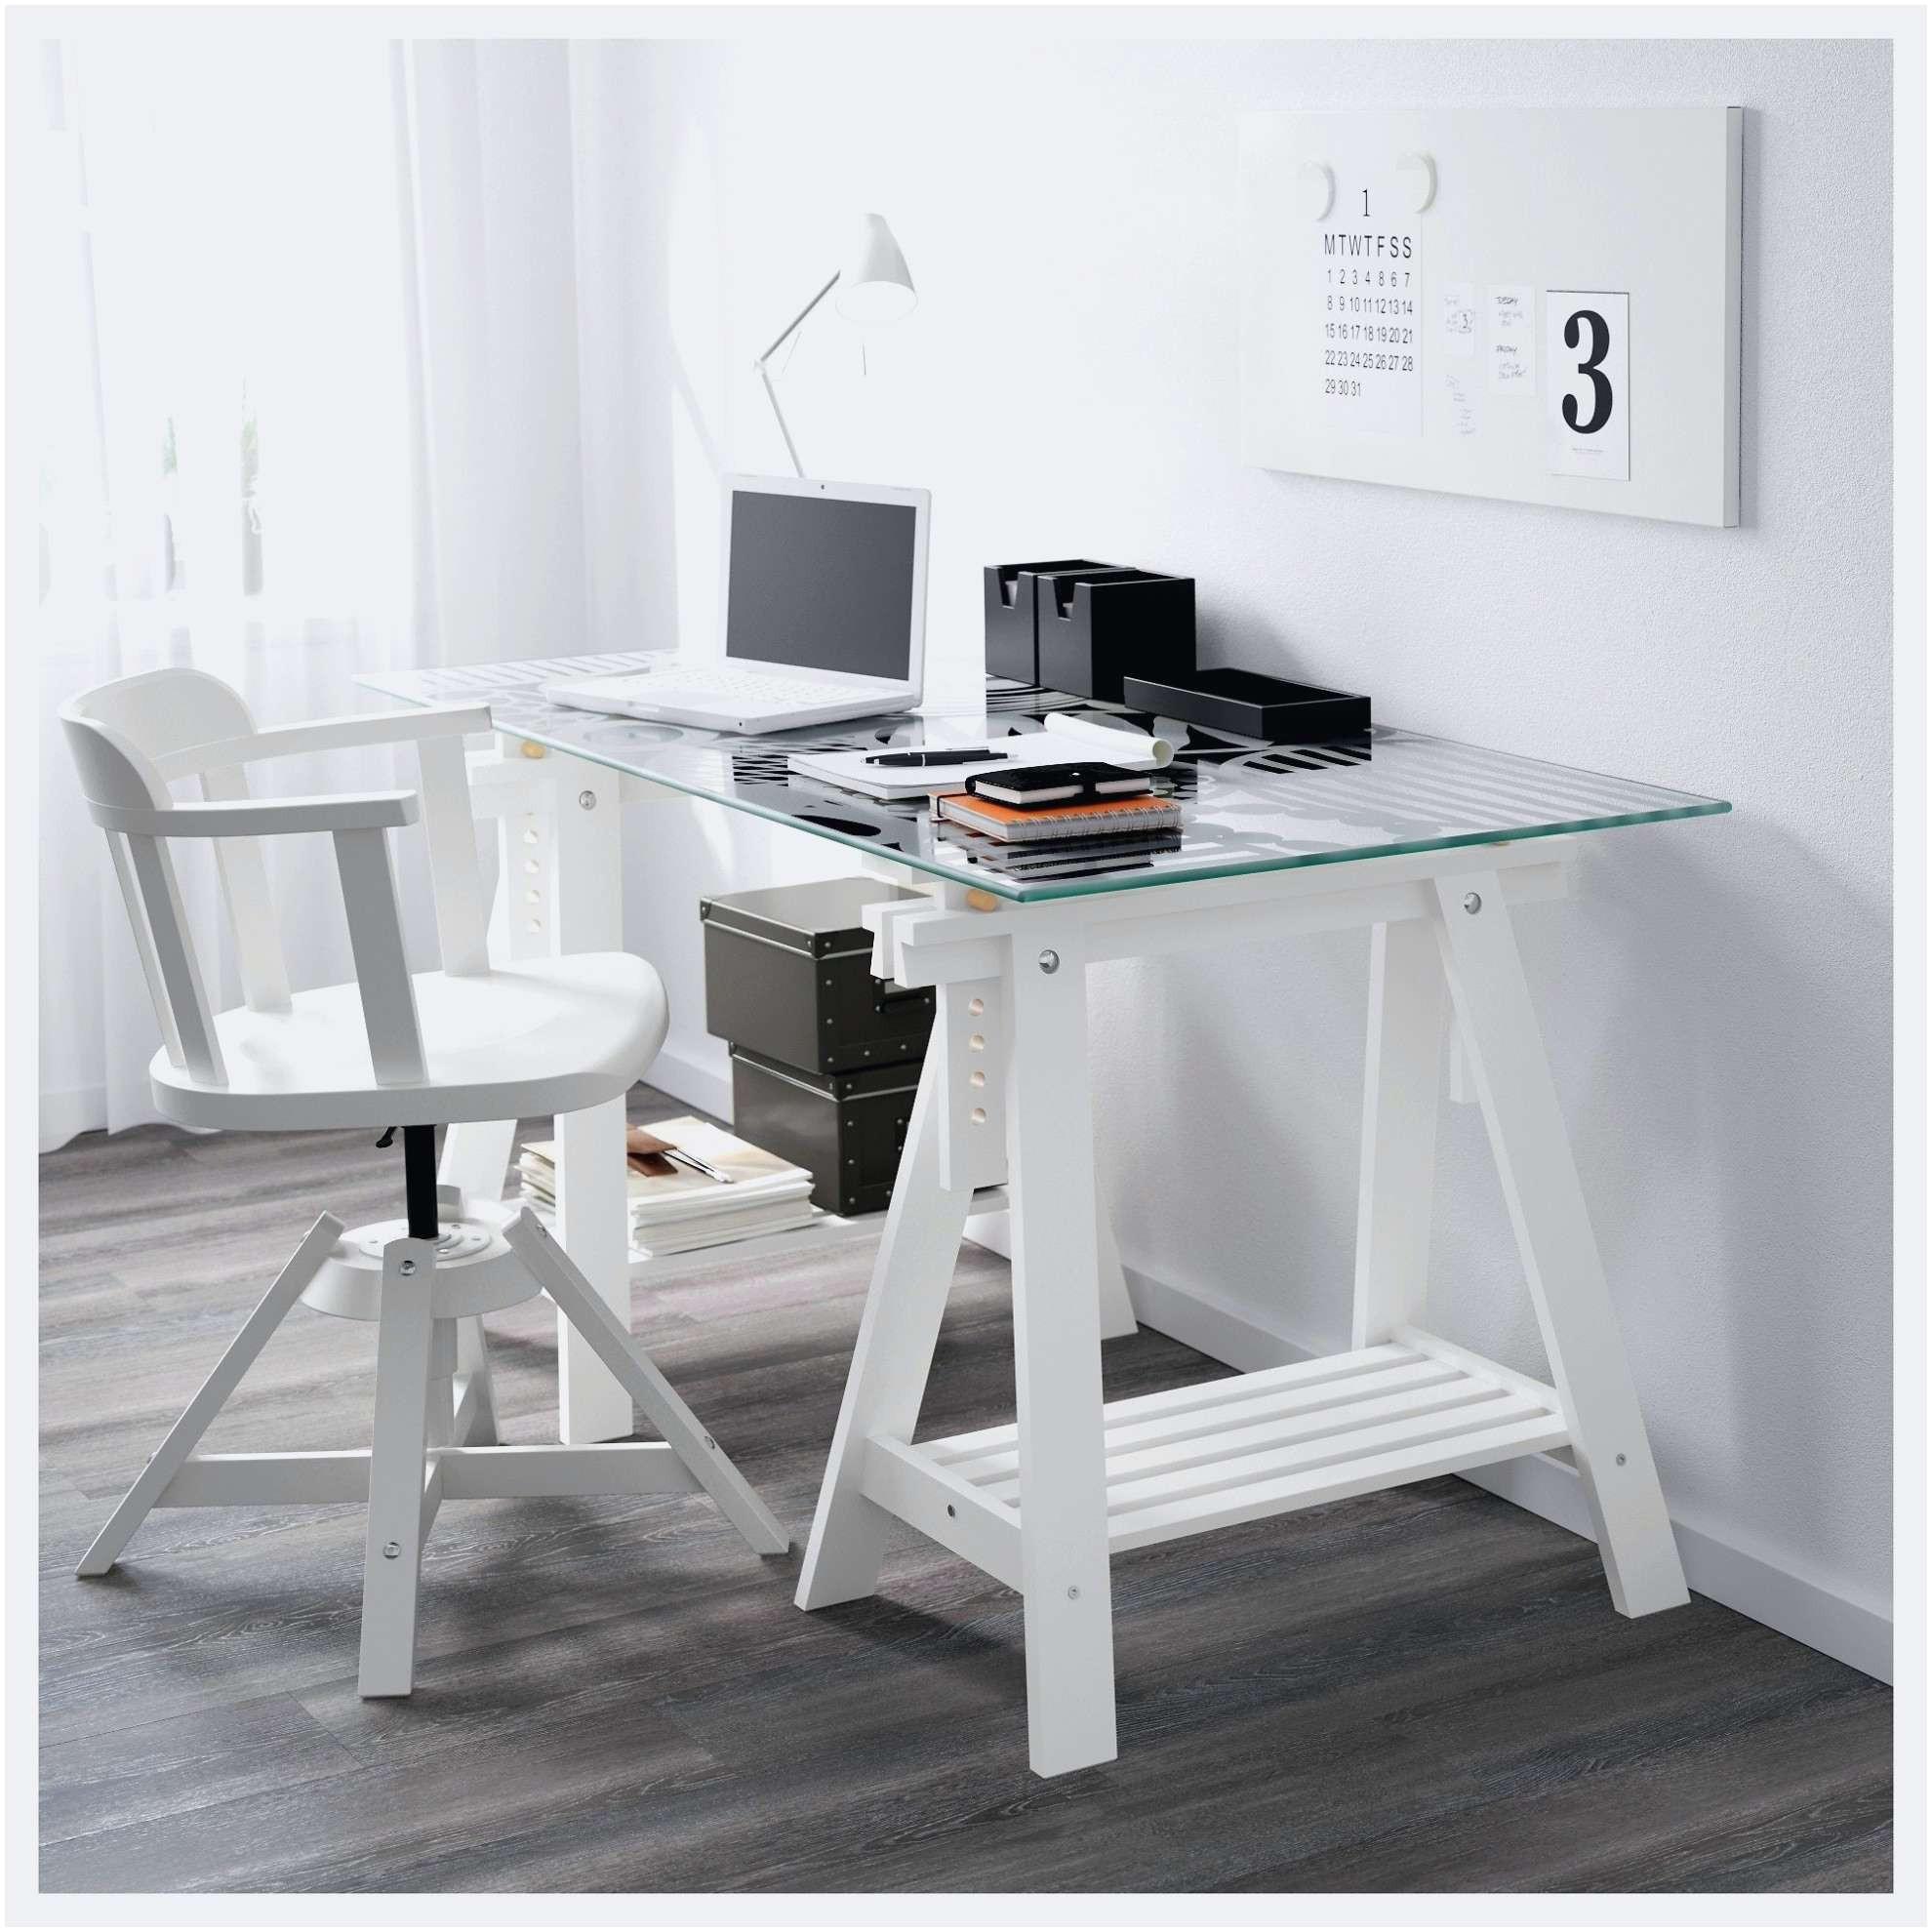 elegant lesmeubles bureau en bois ikea genial jeder kennt kallax regale pour alternative ikea suspension